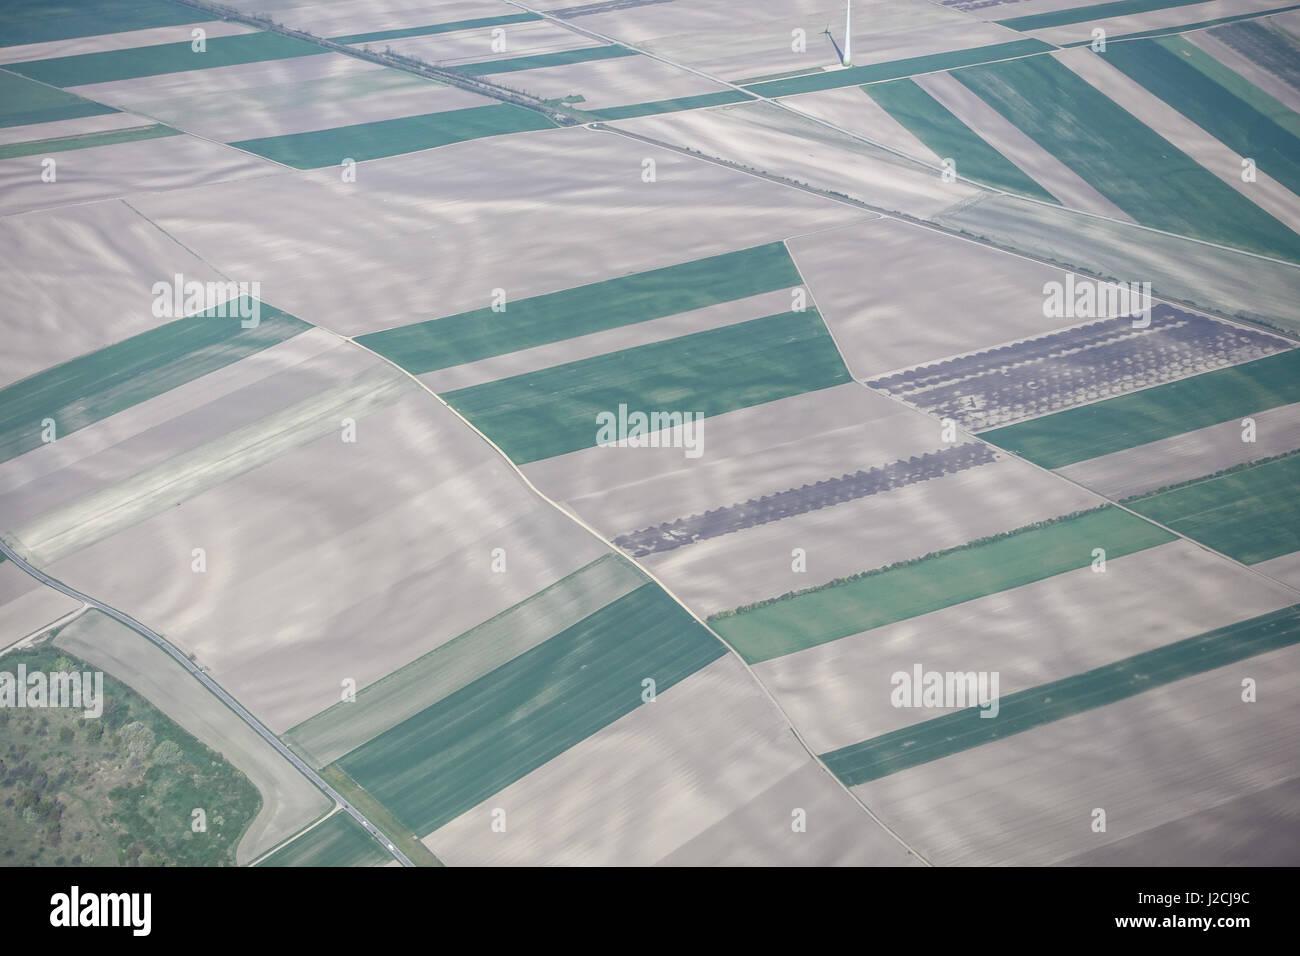 Luftbild - Stock Image